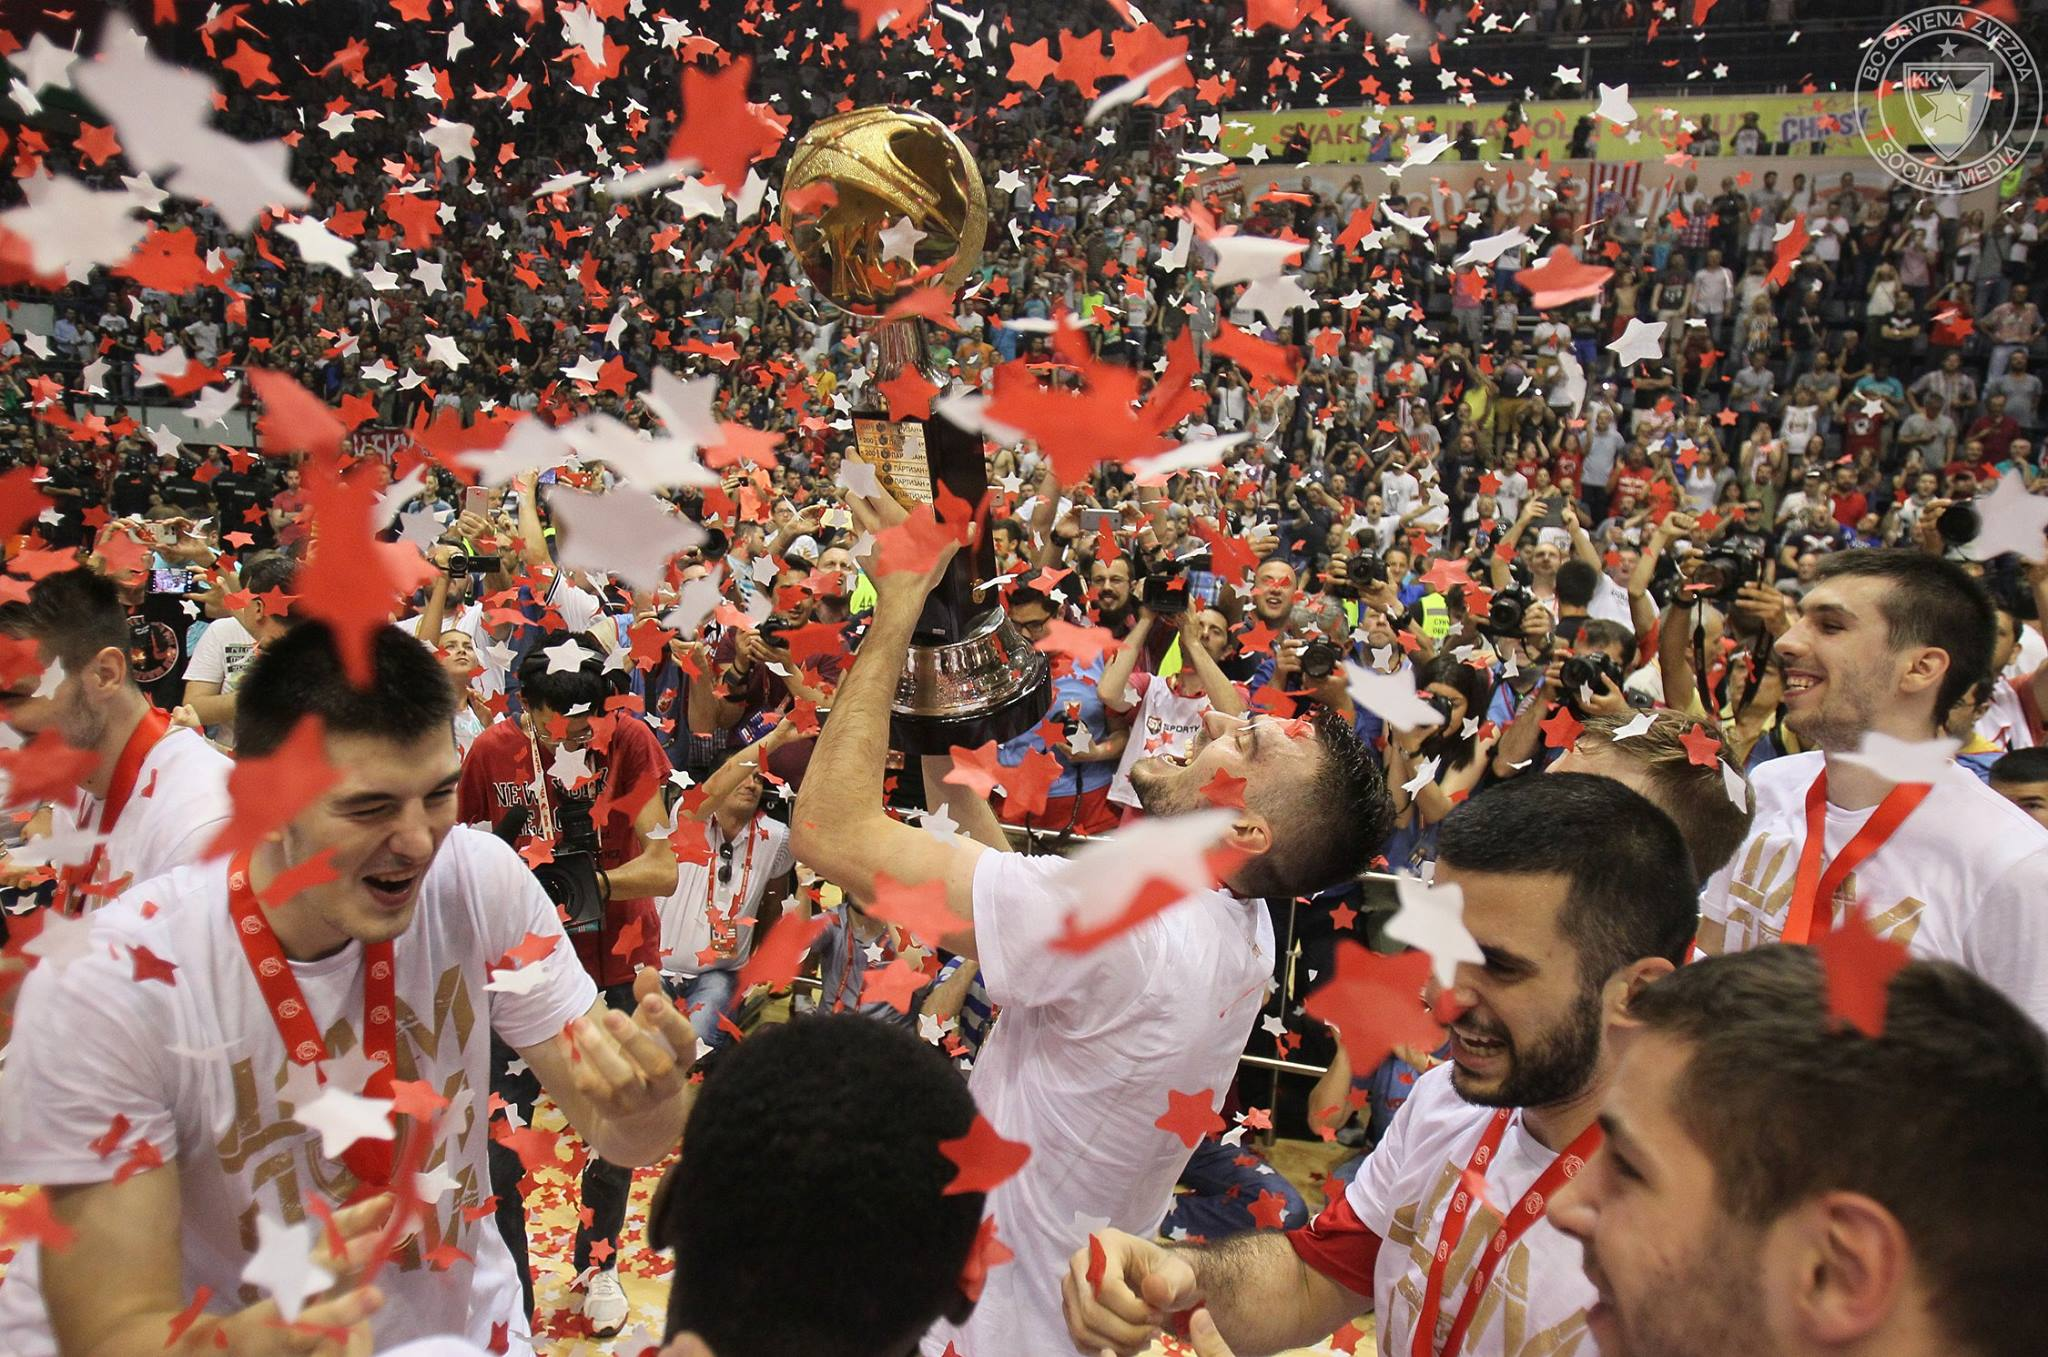 KLS: Crveno-beli proslavili titulu